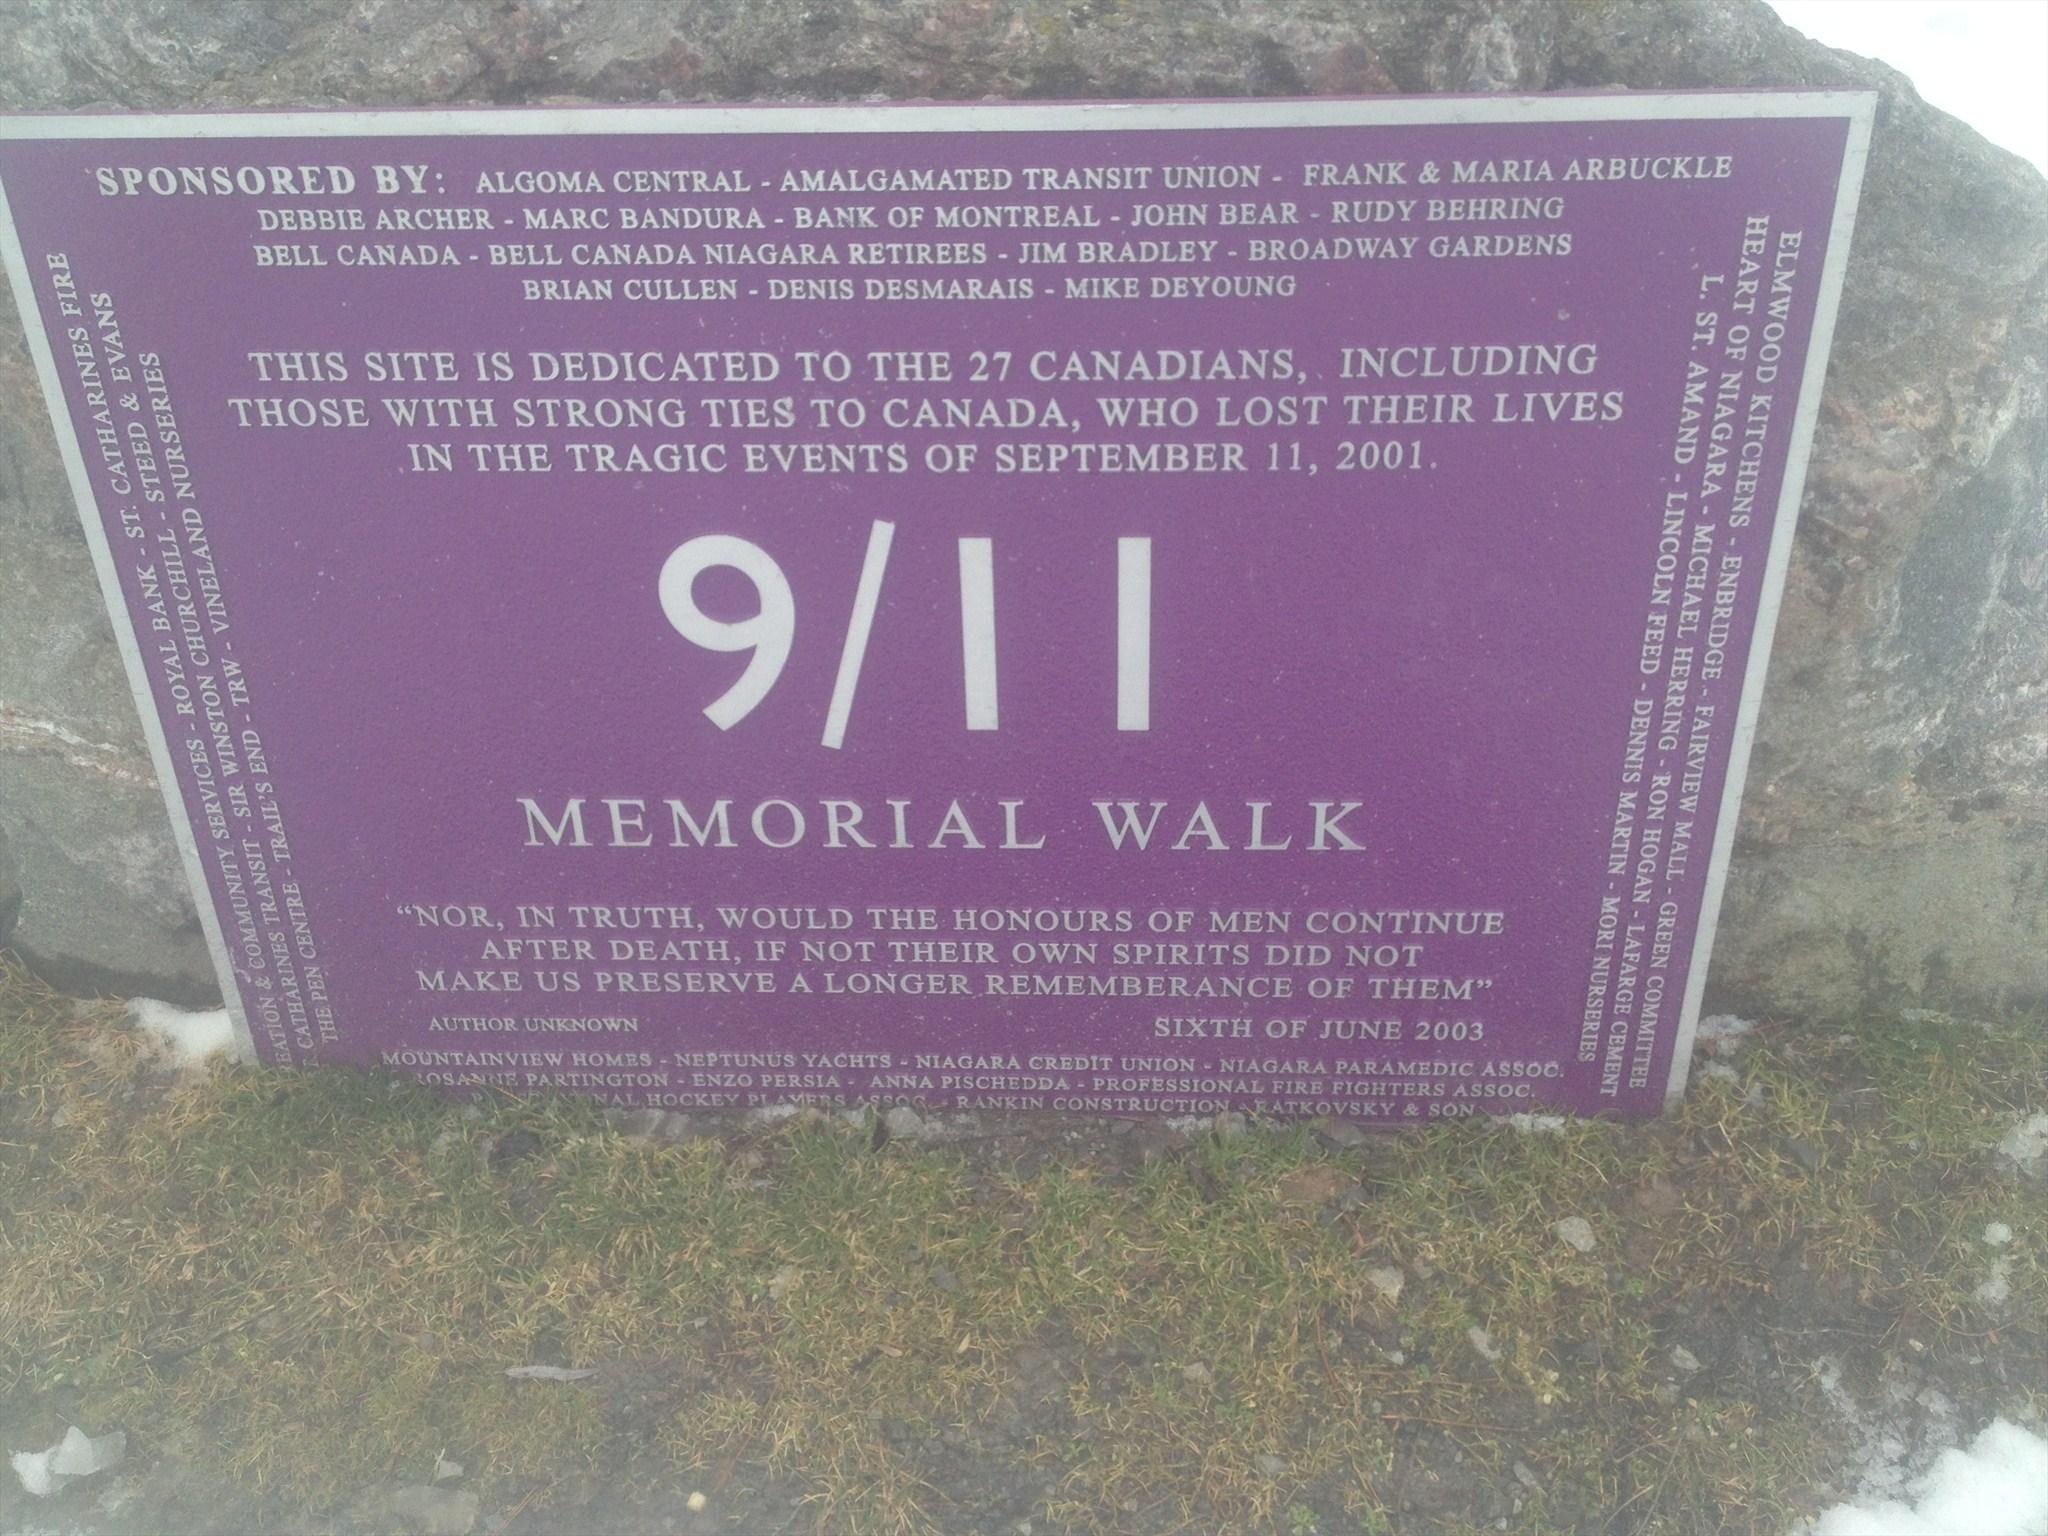 St. Catharines Memorial Walk Canada 4.JPG